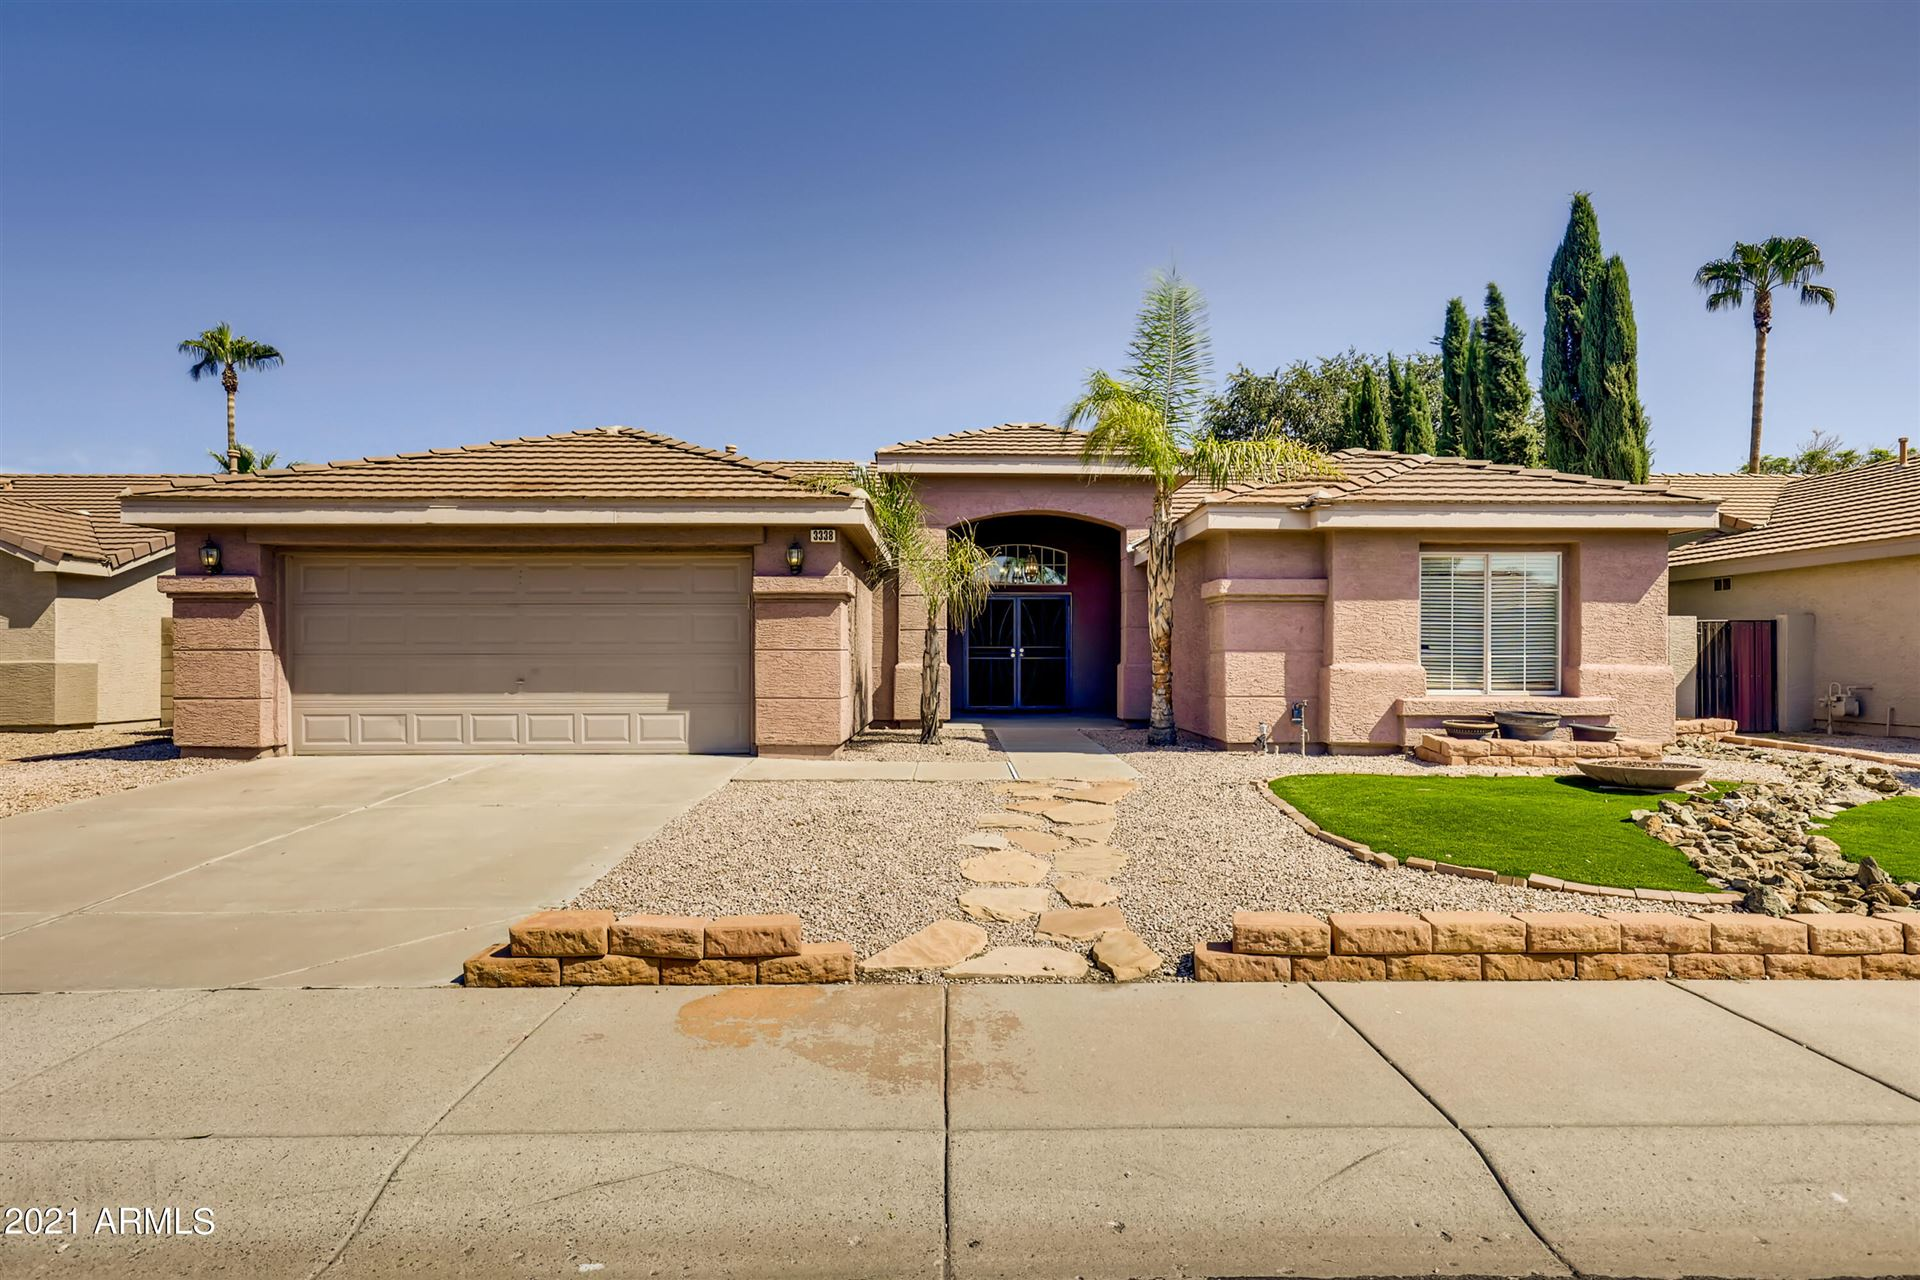 3338 E MARCO POLO Road, Phoenix, AZ 85050 - MLS#: 6283412